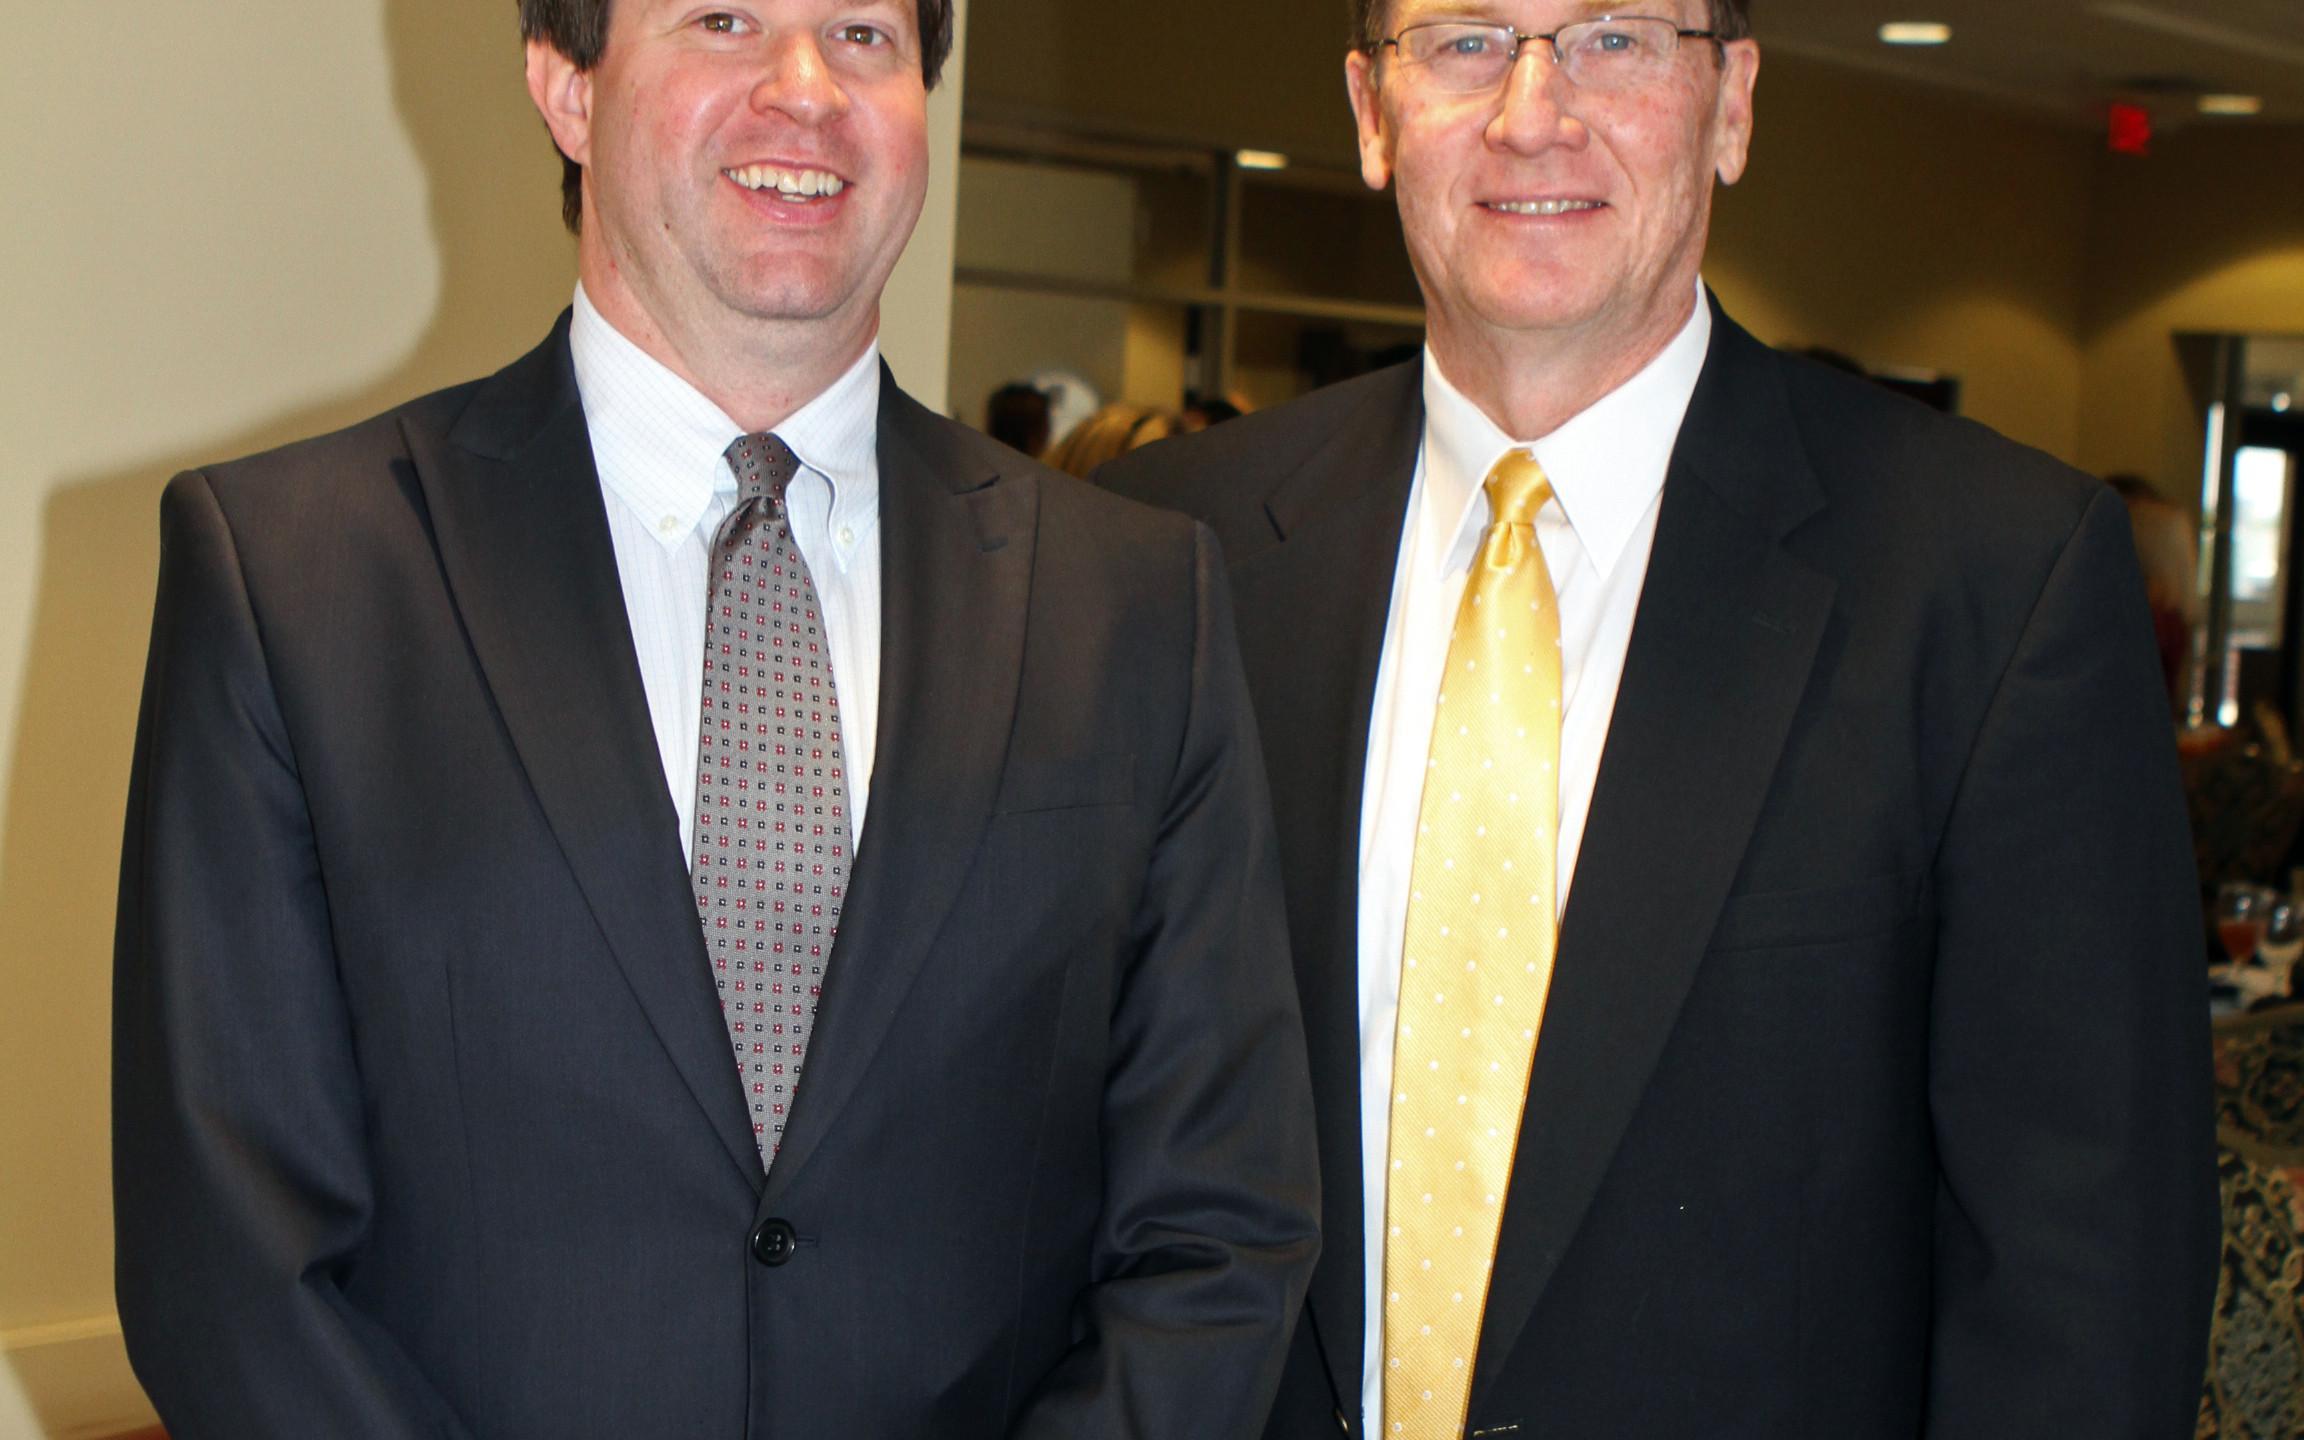 Judge Michael Dale, Judge Larry McMillan